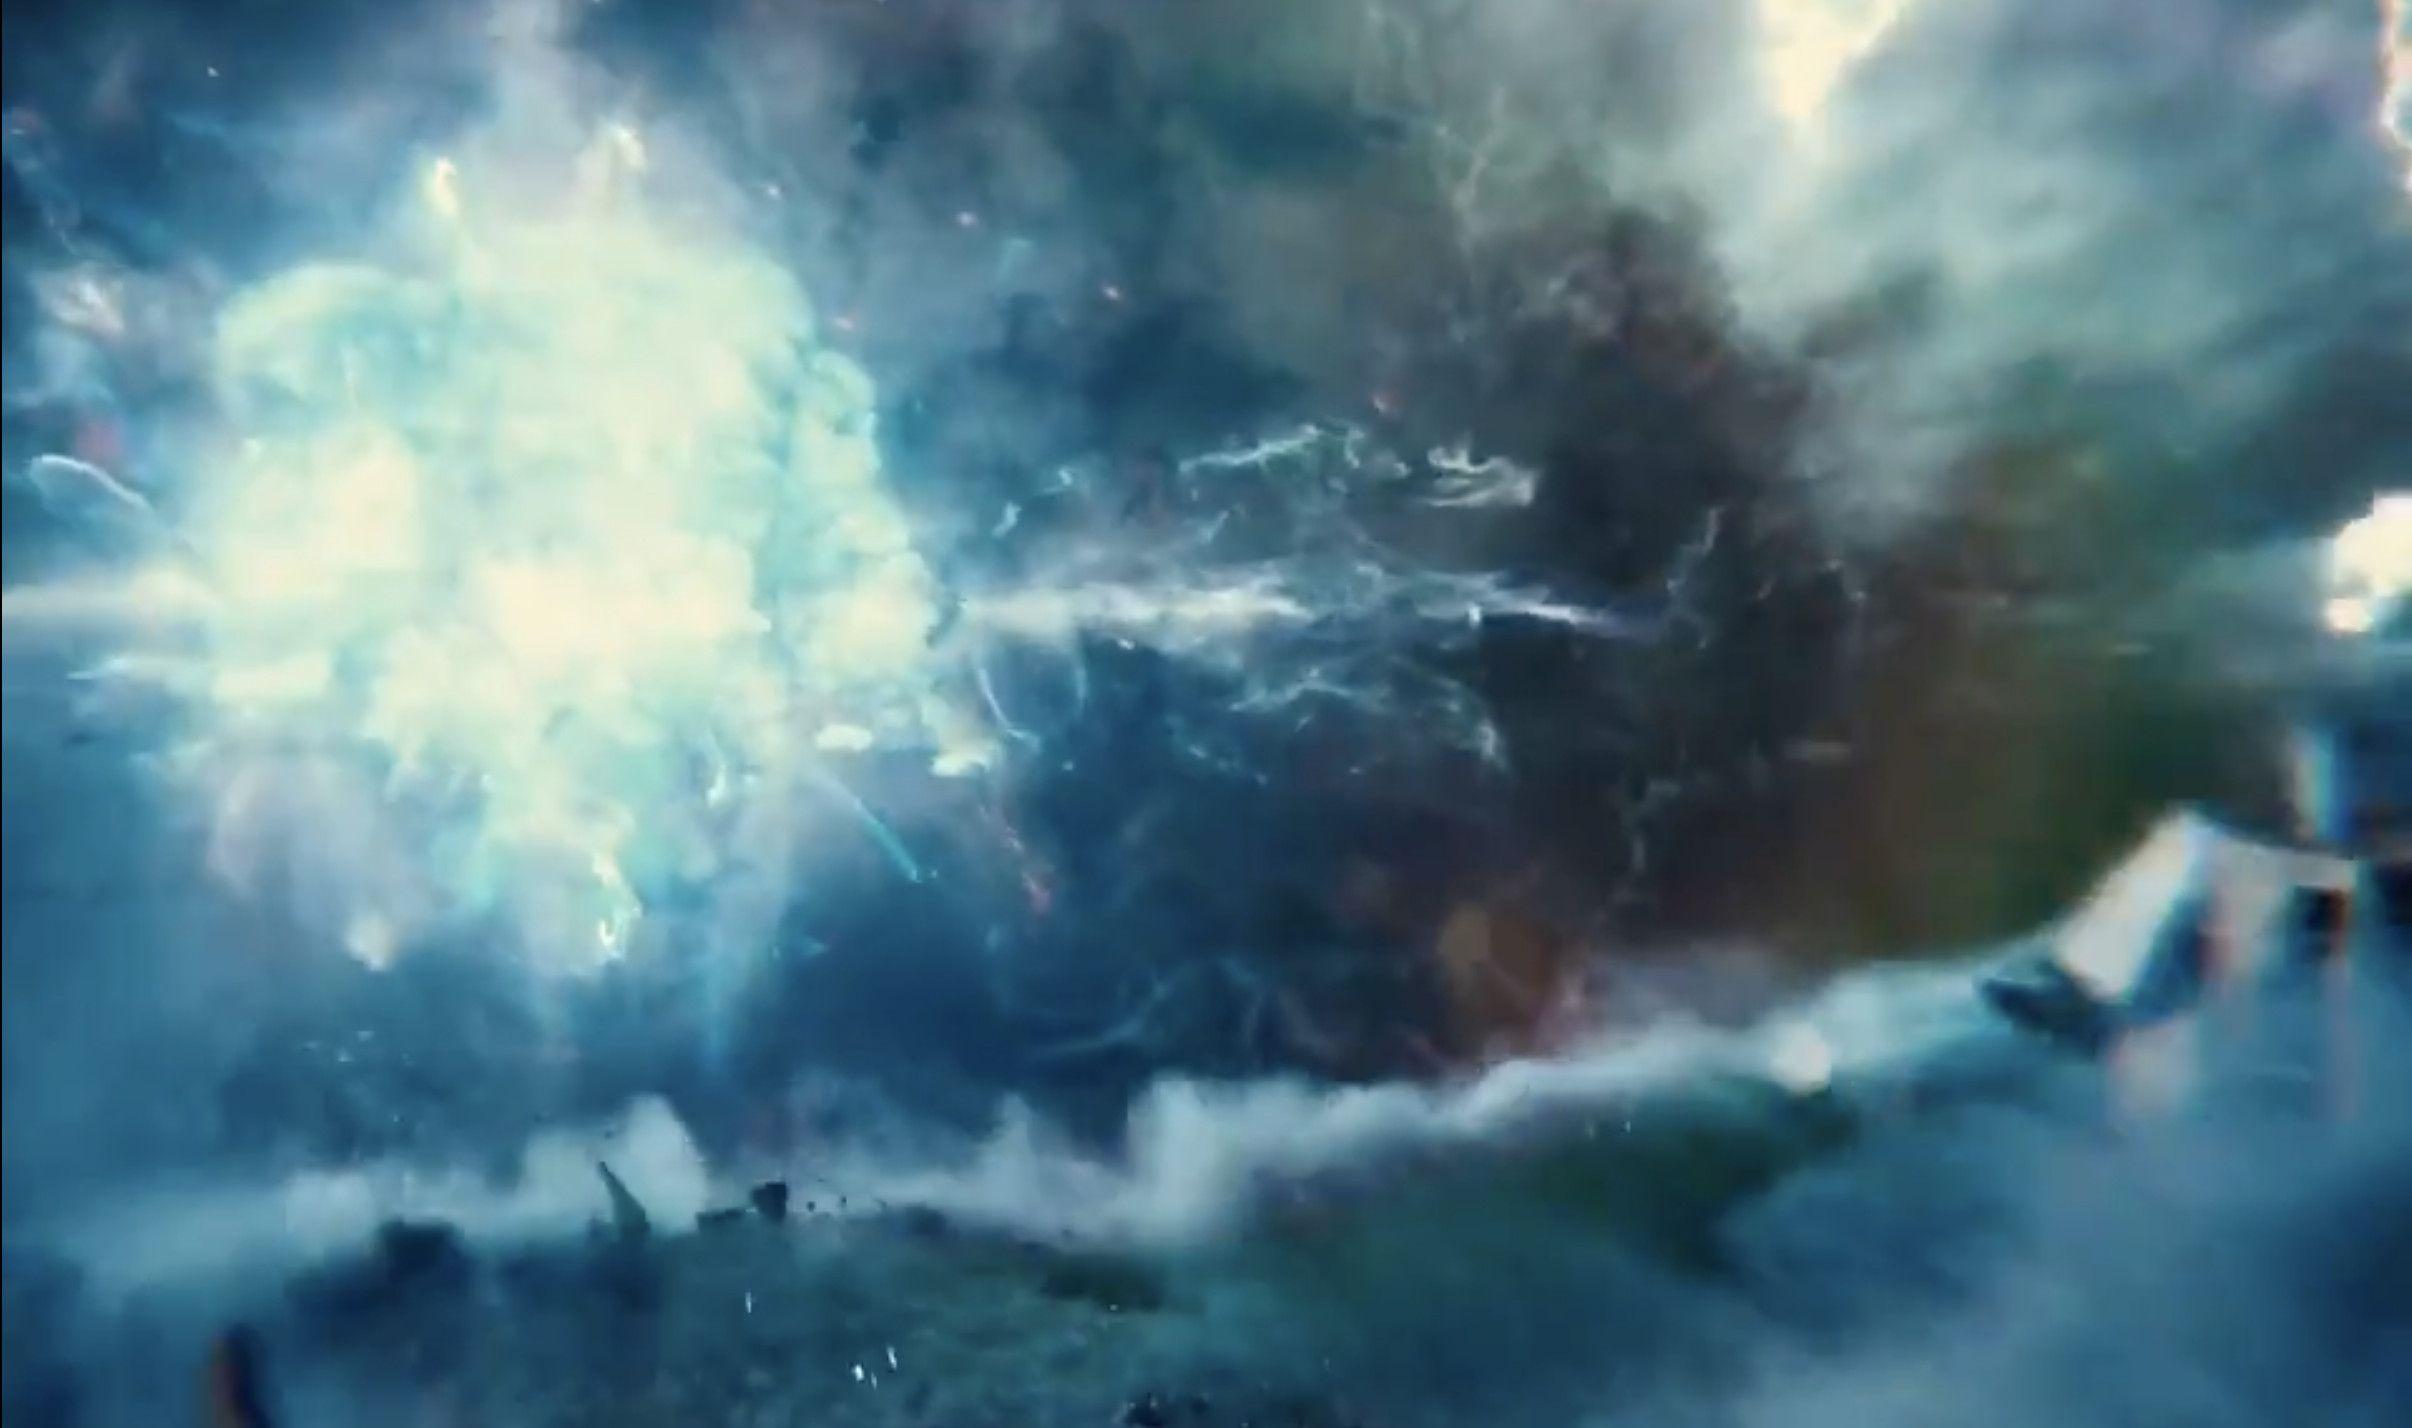 Explosion reverses